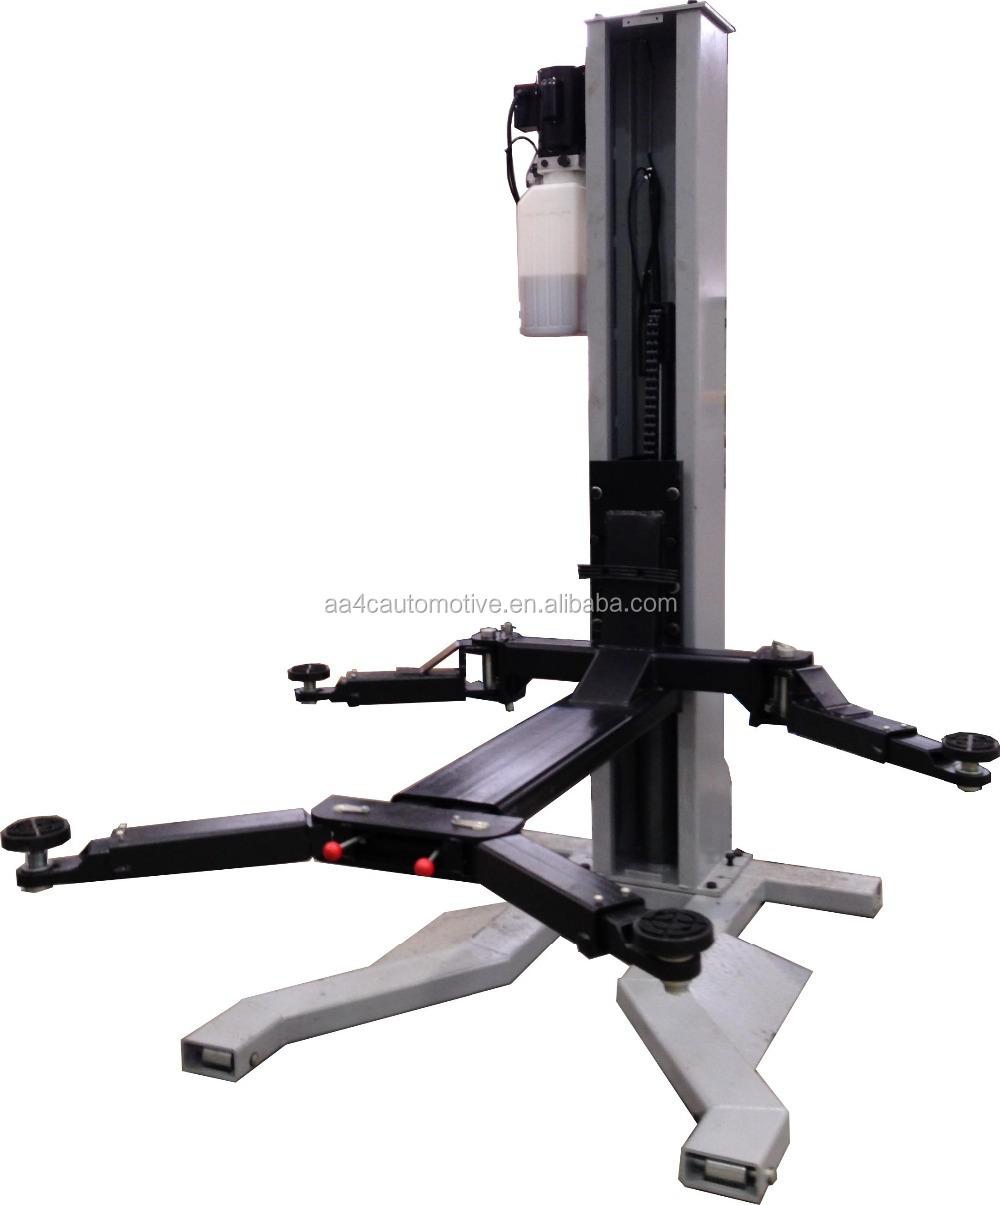 Hydraulic Lift Accessories : Cheap hydraulic portable car lift equipment buy